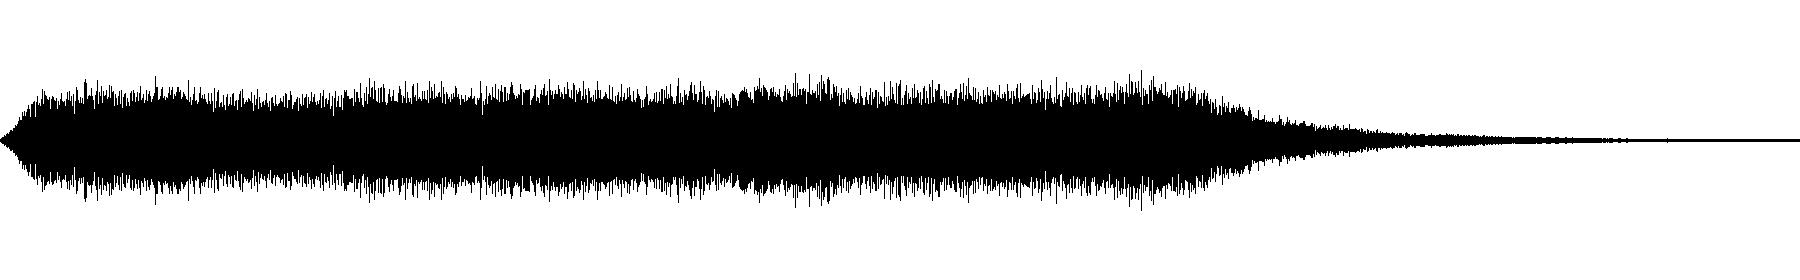 organ gm